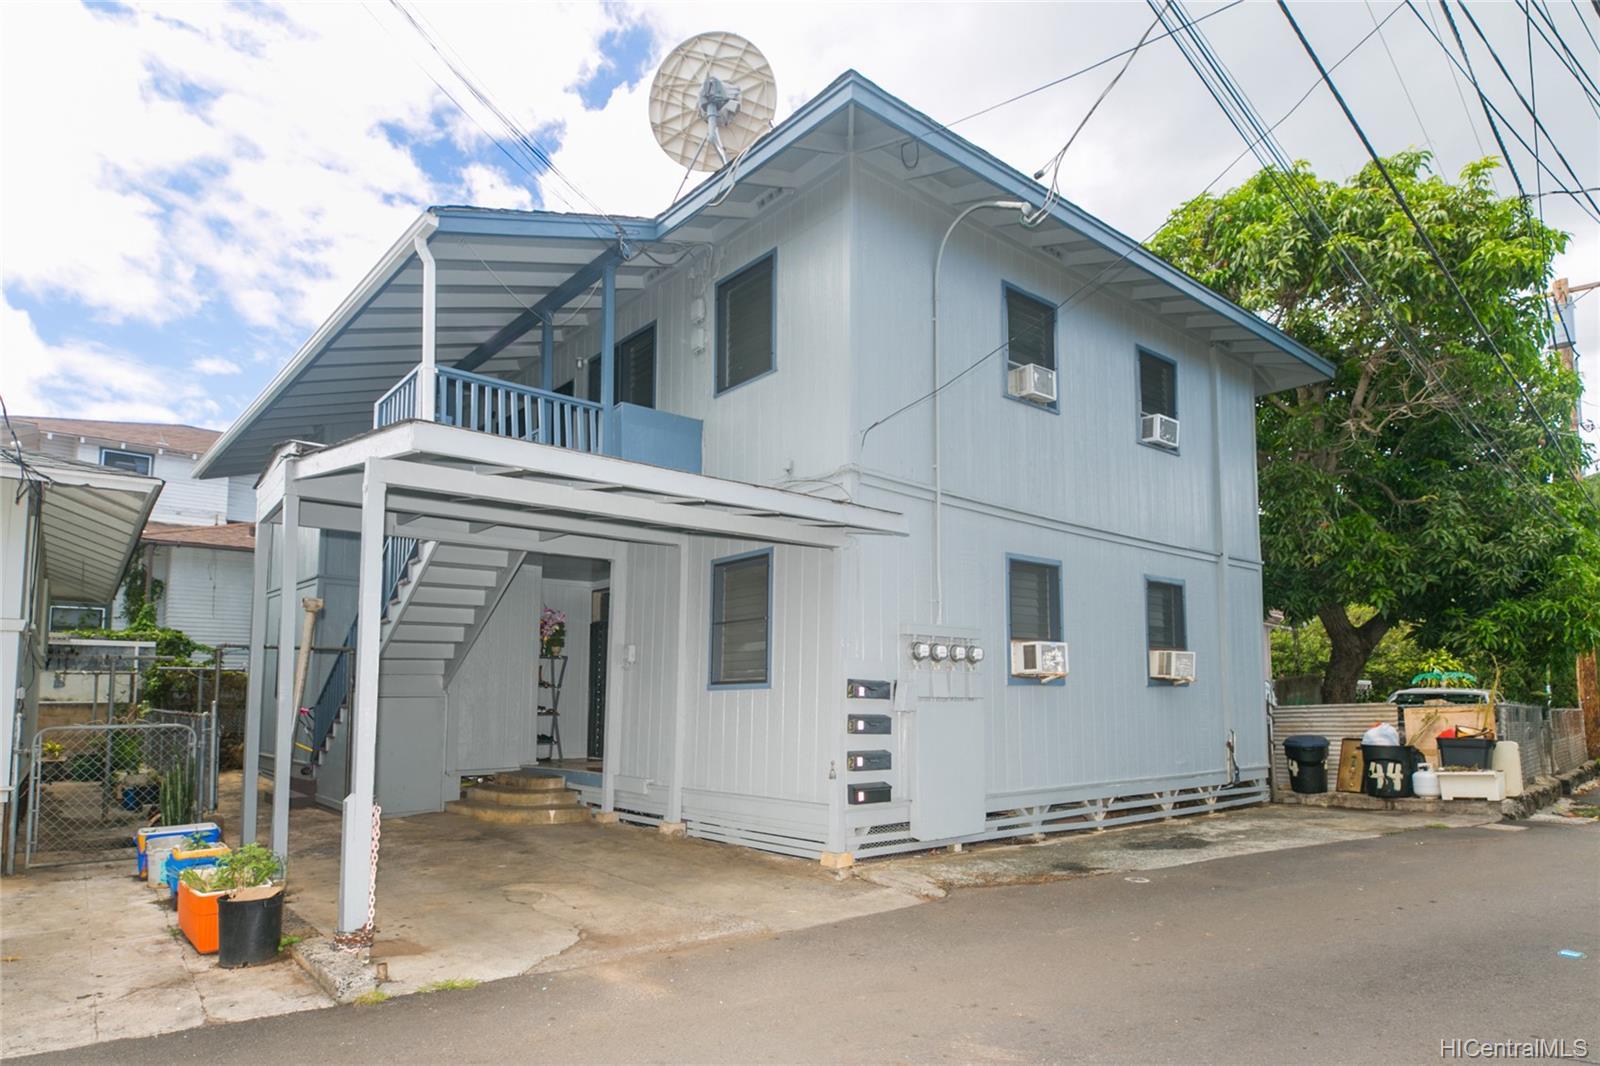 44 Kauila Street Honolulu - Multi-family - photo 1 of 18